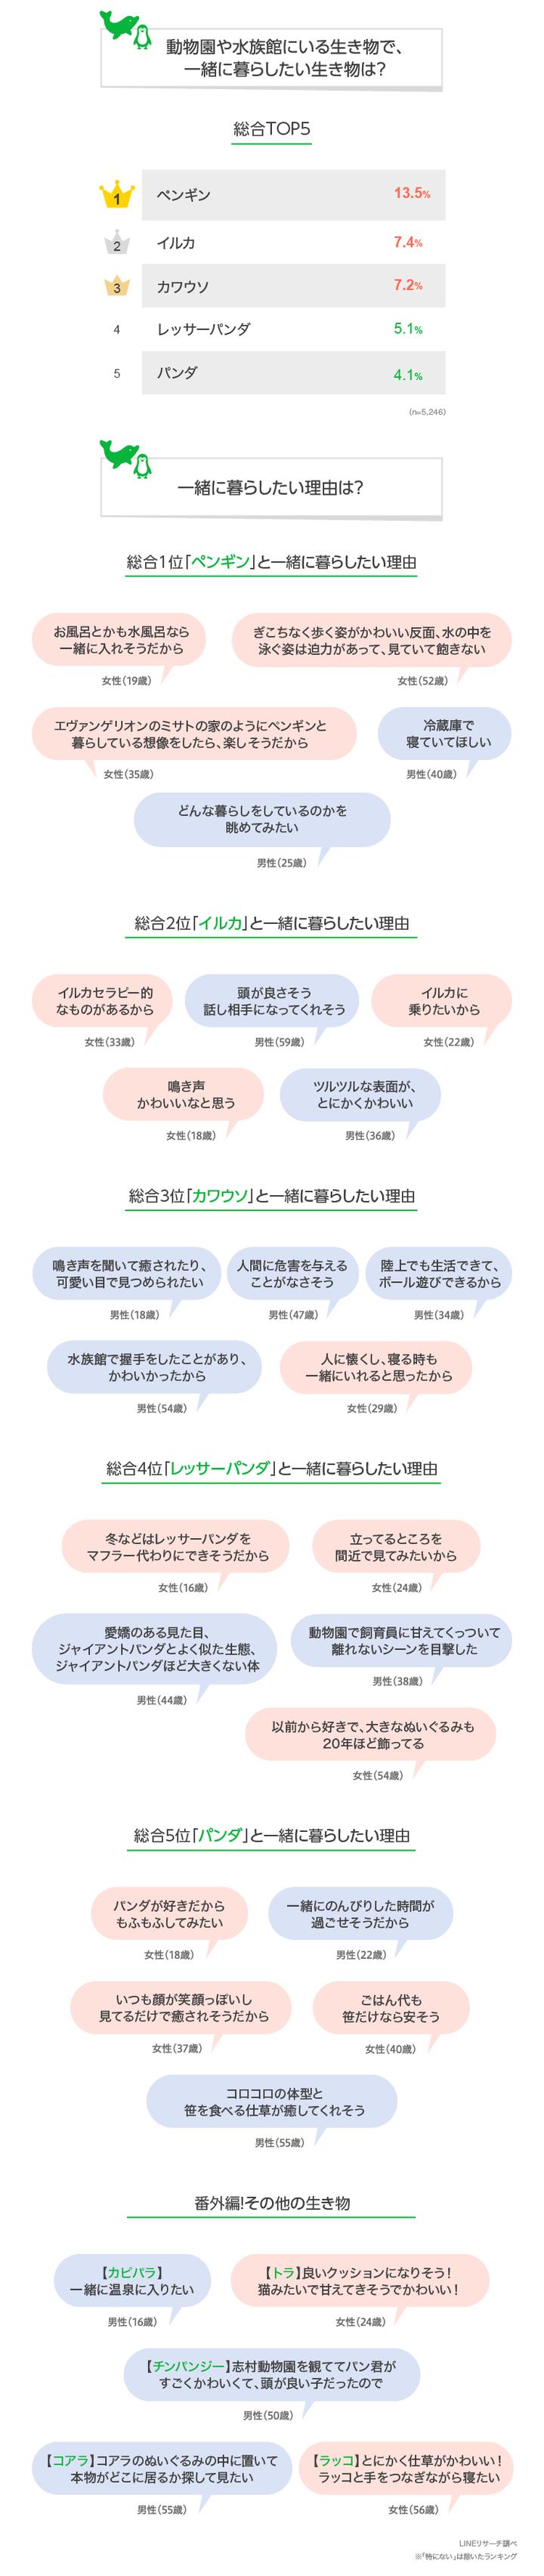 graph_1 (4)